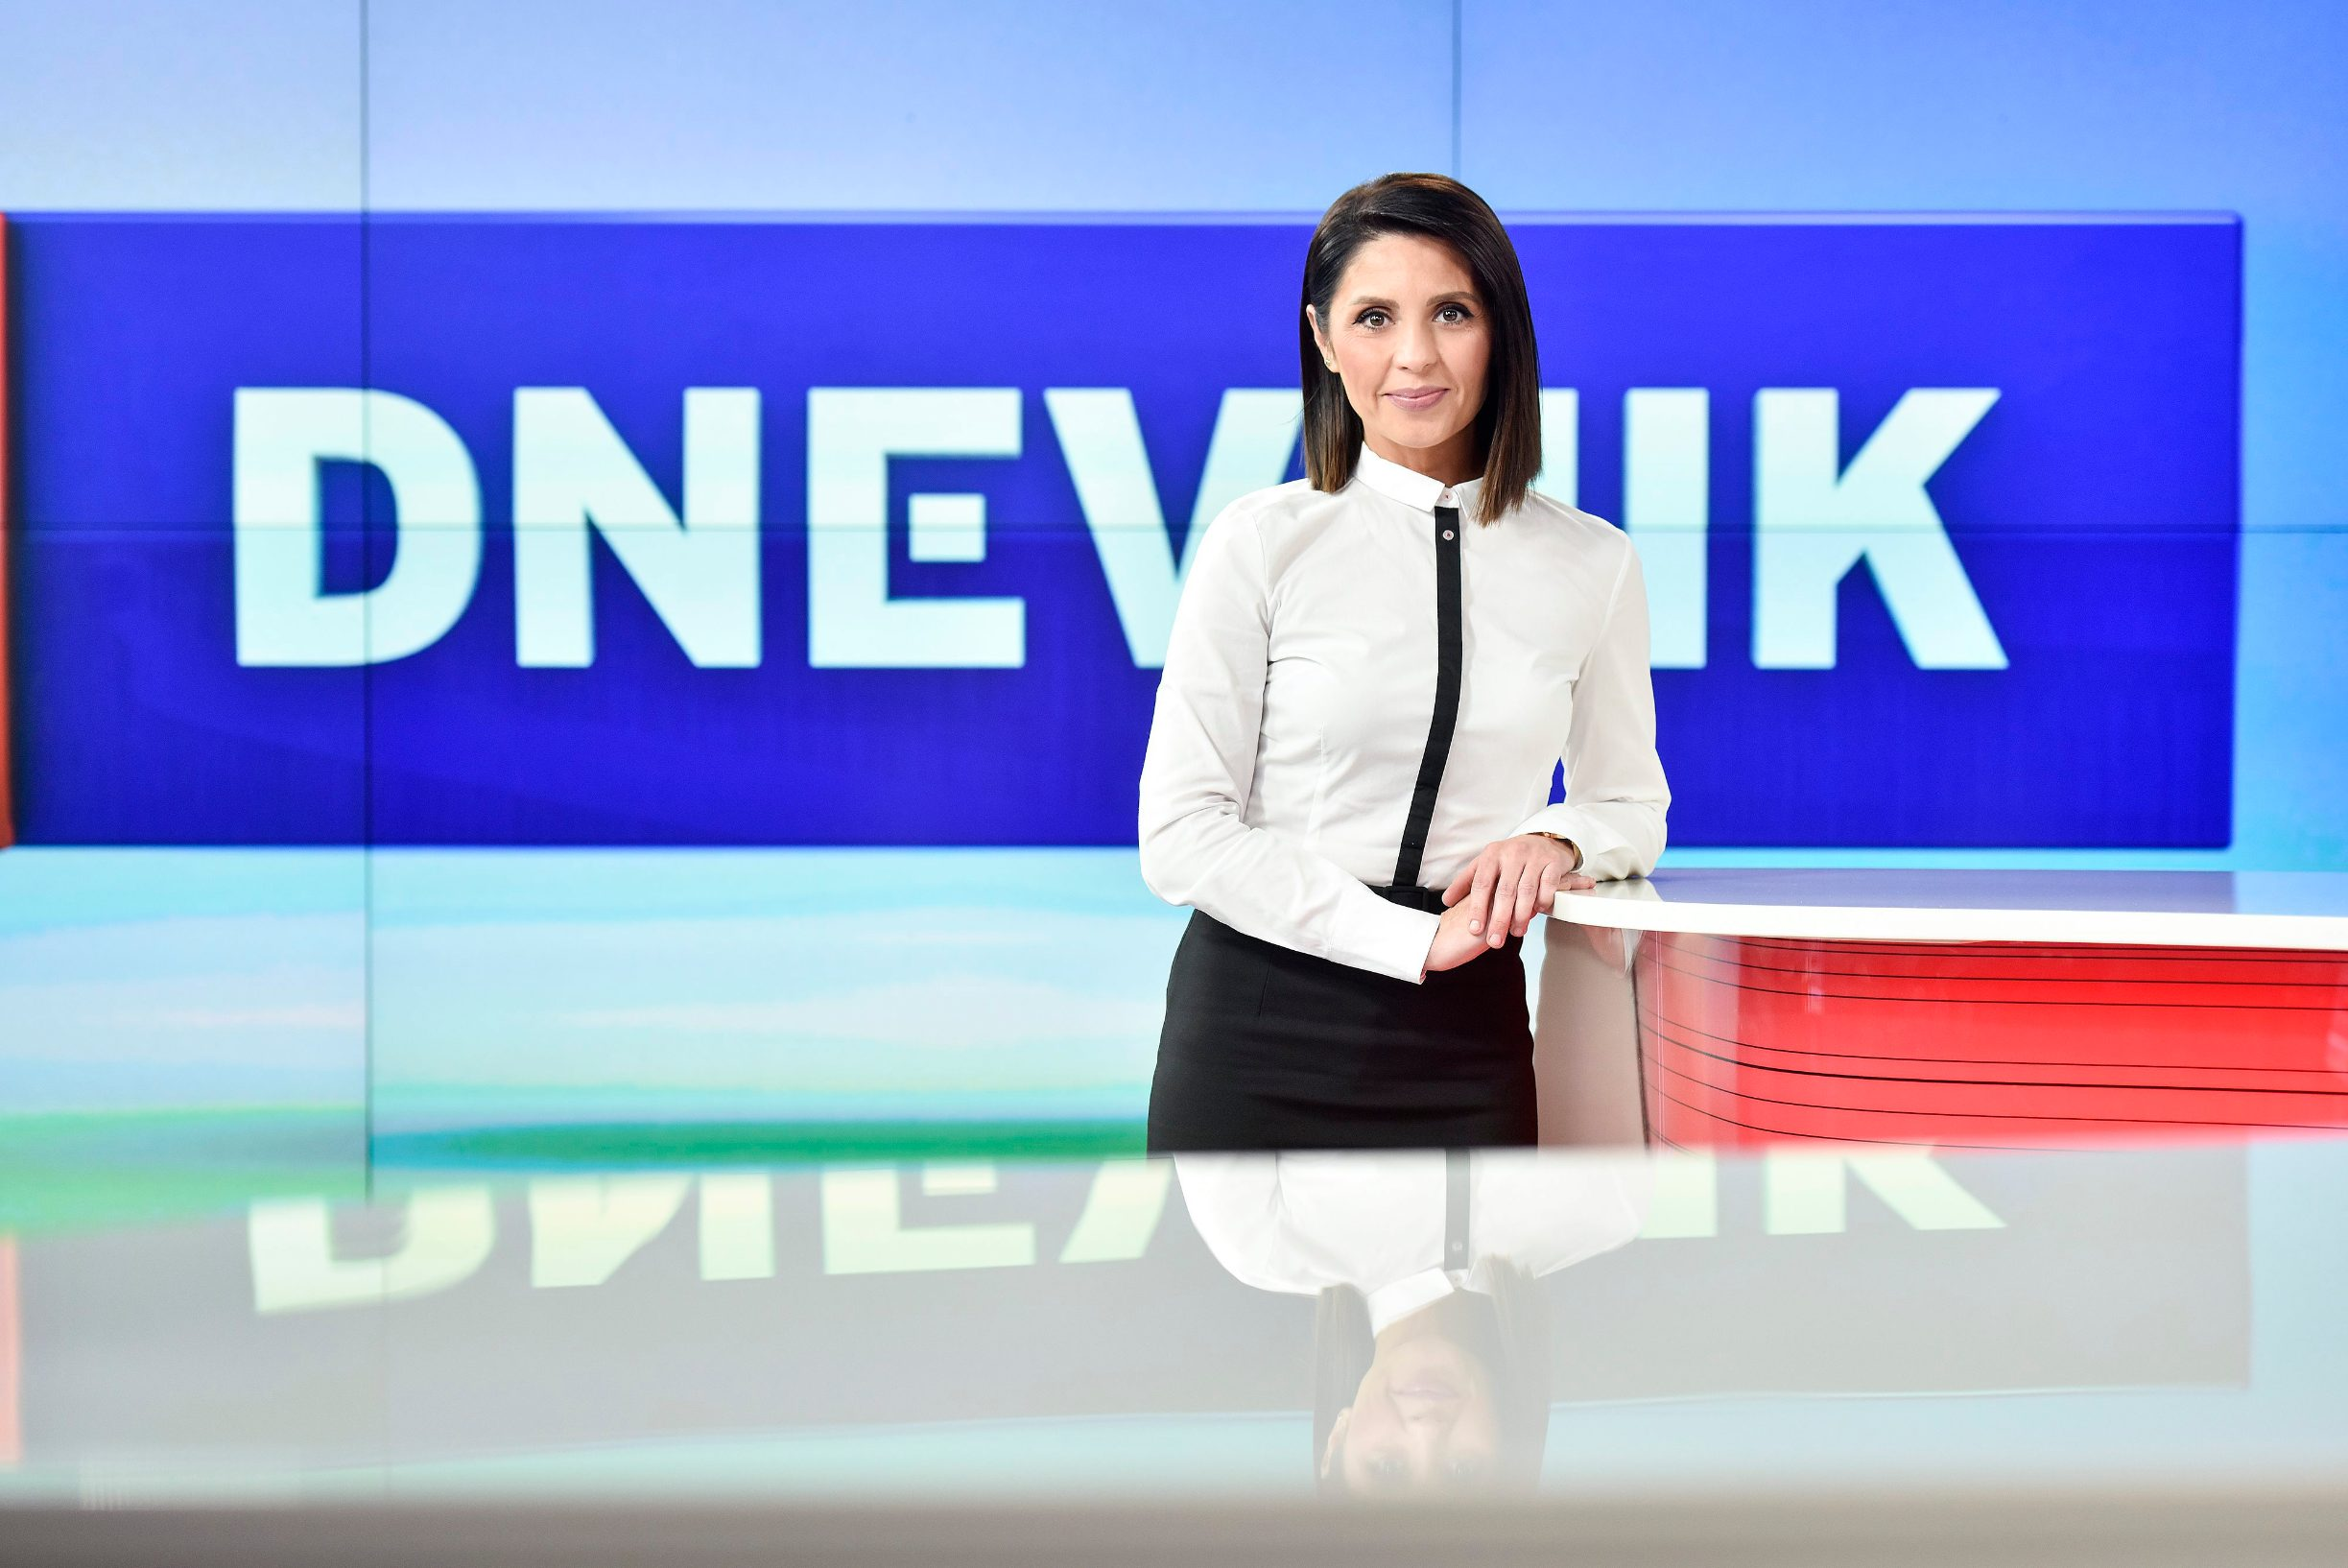 Zagreb, 231017. Marija Miholjek je novinarka i trenutacna voditeljica sredisnje informativne emisije Dnevnik Nove TV. Foto: Sandra Simunovic / CROPIX